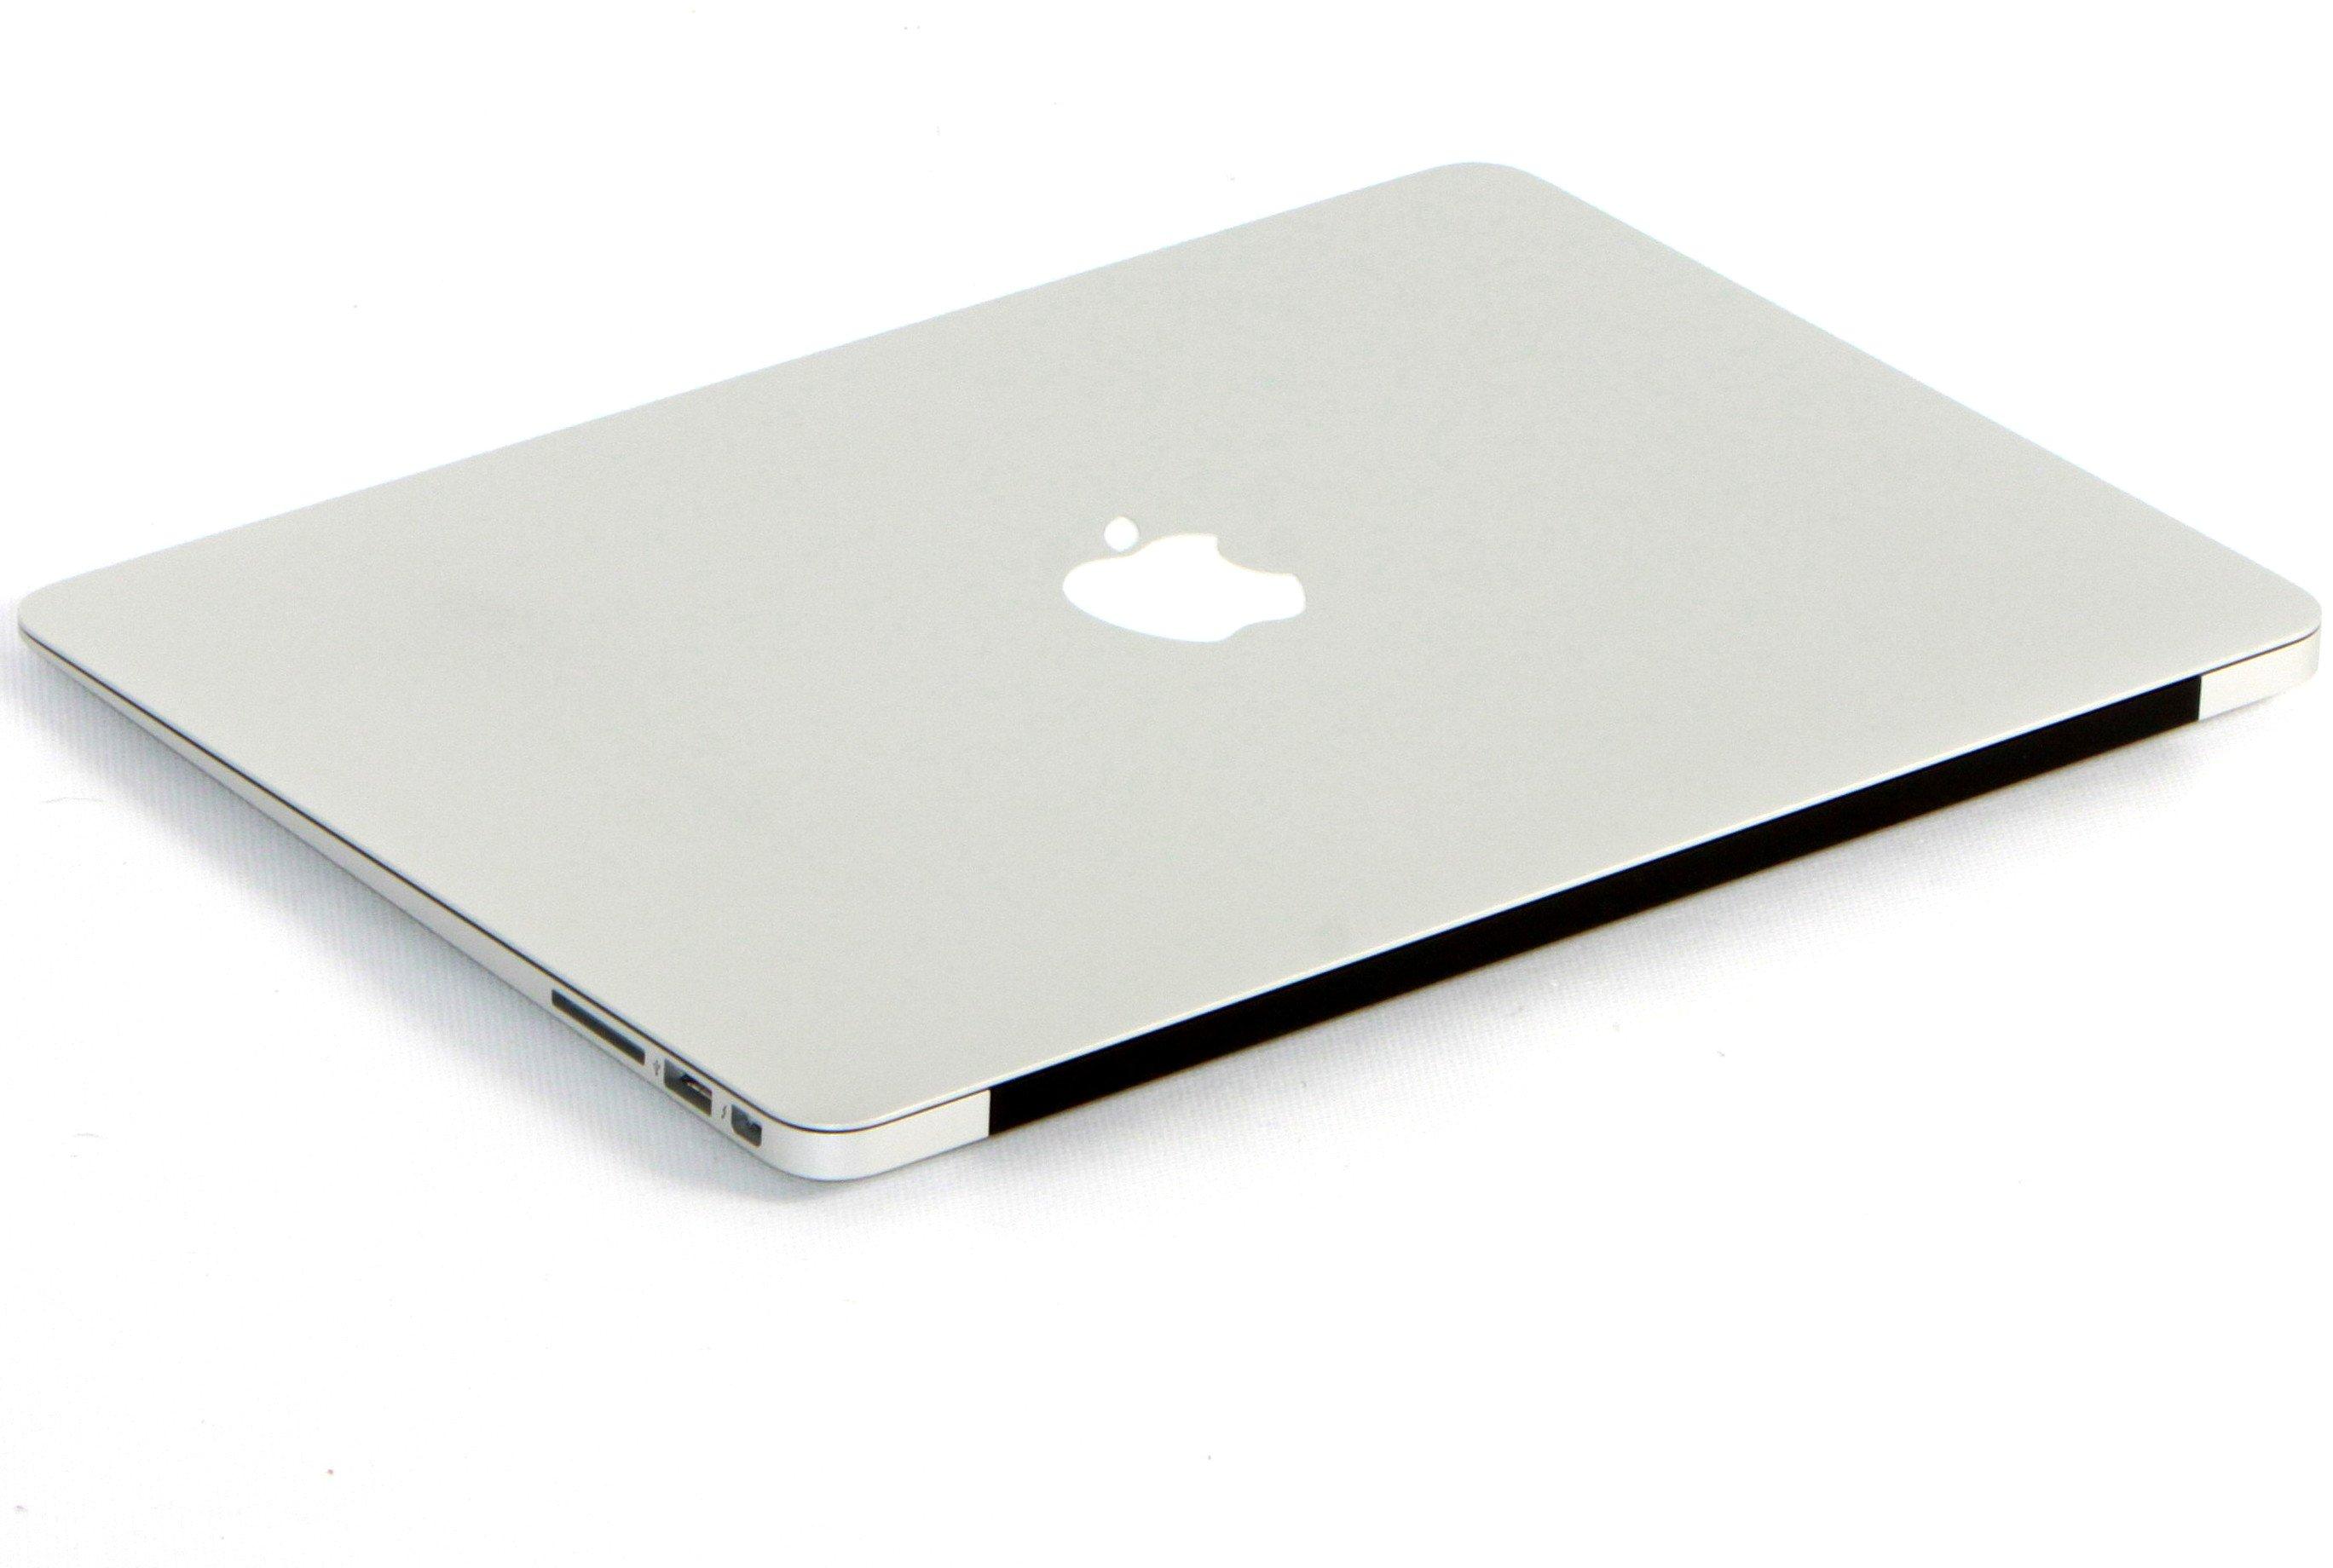 "Macbook Air 11"" Reparatur"